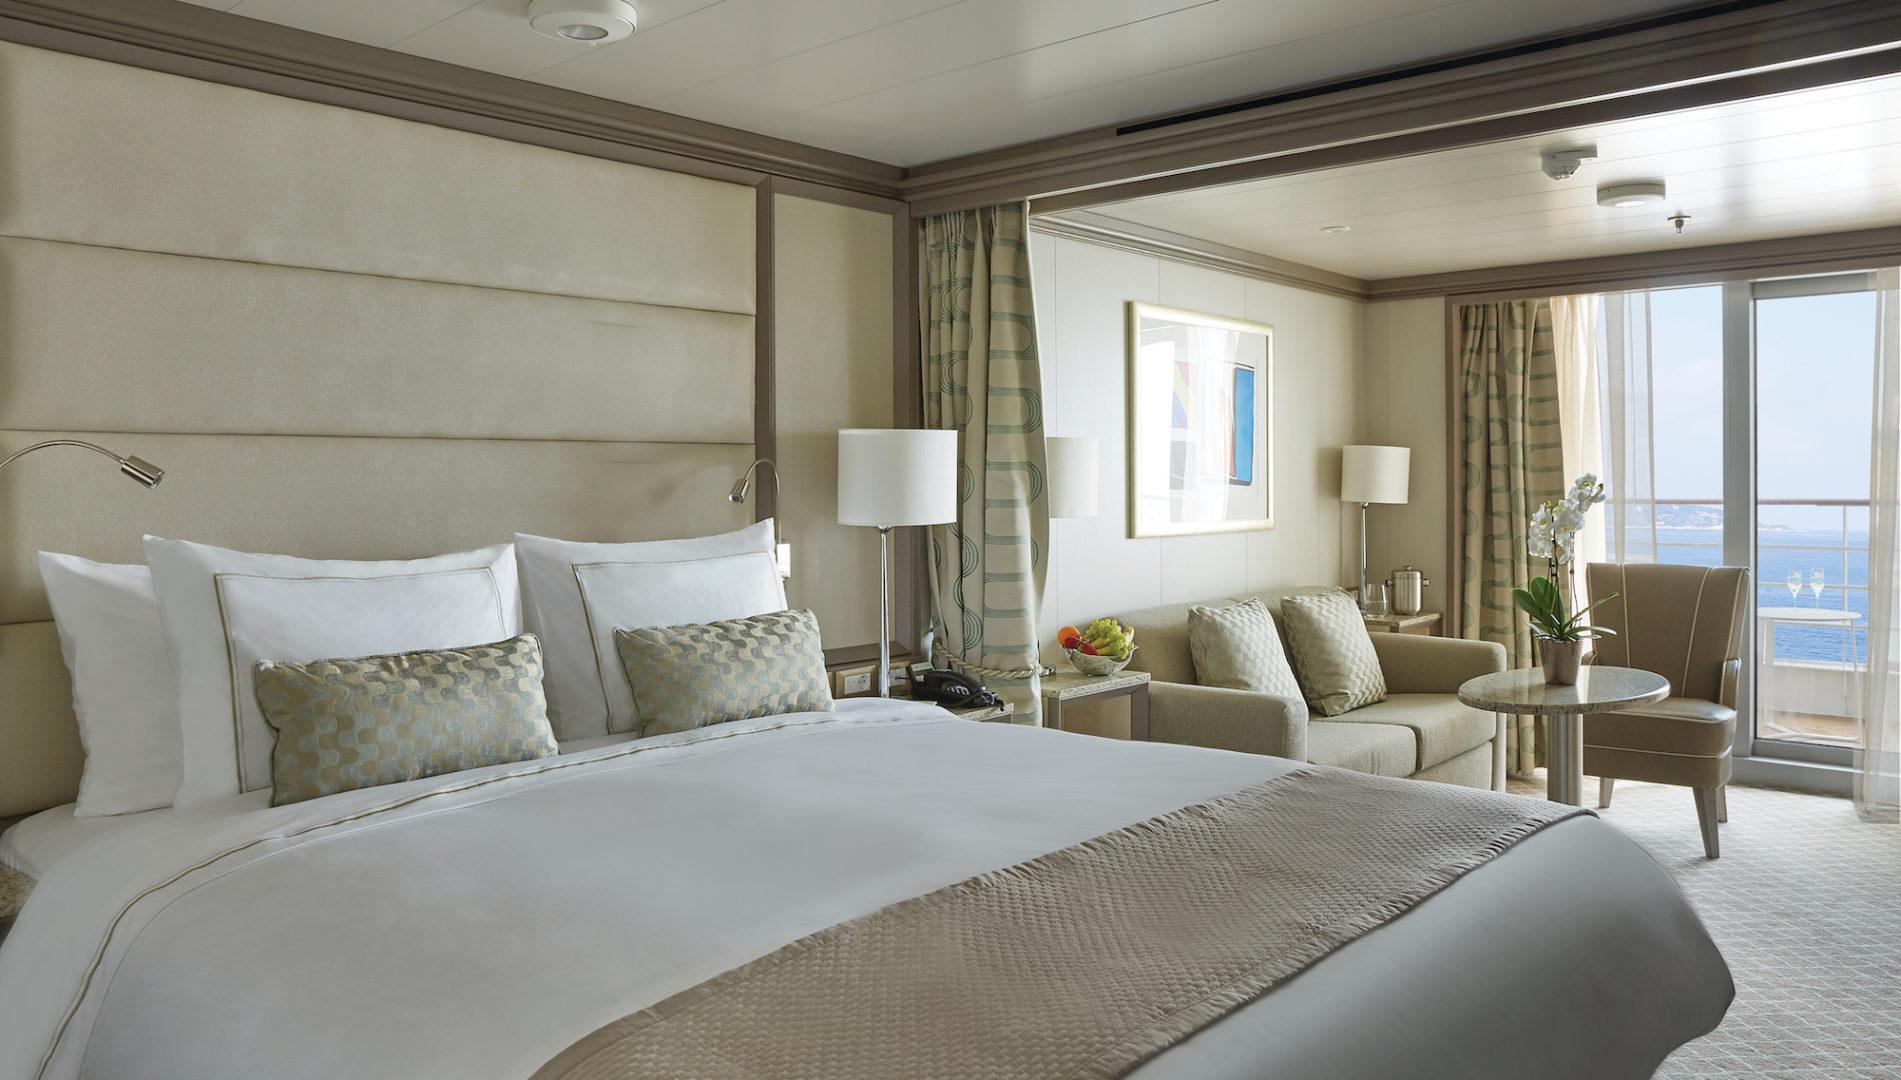 Silver Muse, Veranda, bed, balcony, plant, bed, cushions, lamp, sea, champagne